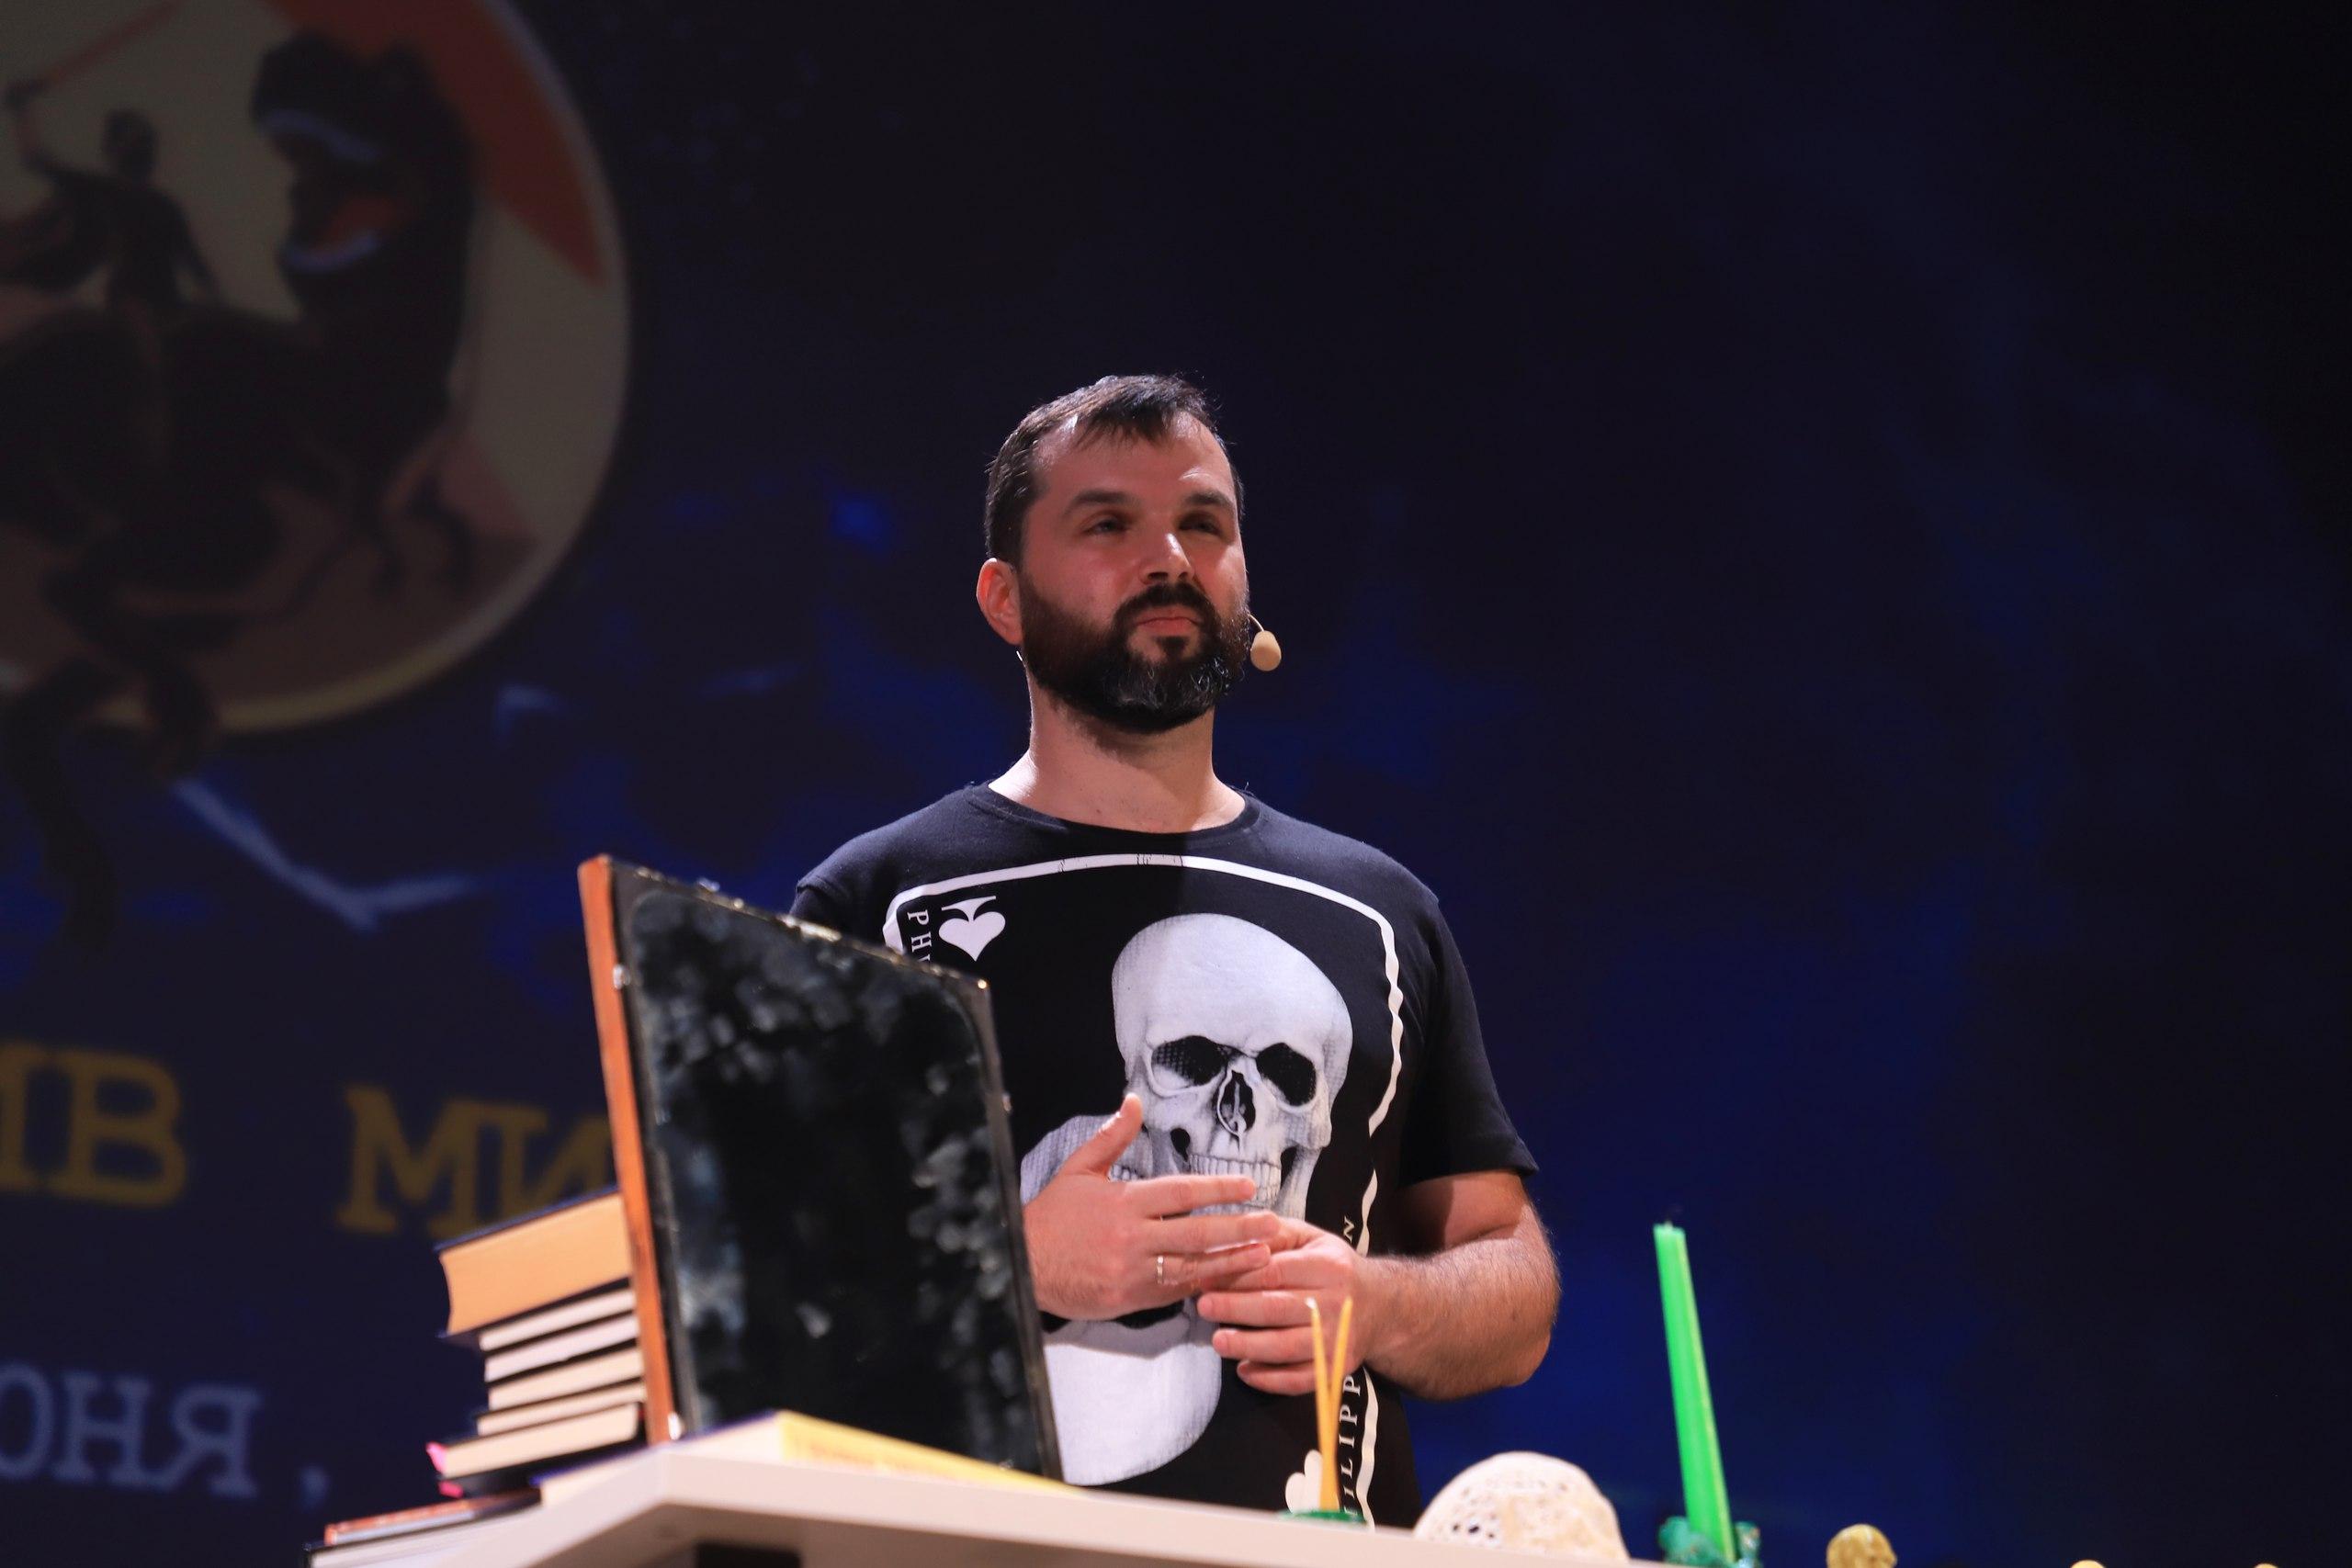 Александр Соколов проводит ритуалы по отвороту критики. || Фото G.R. Photo